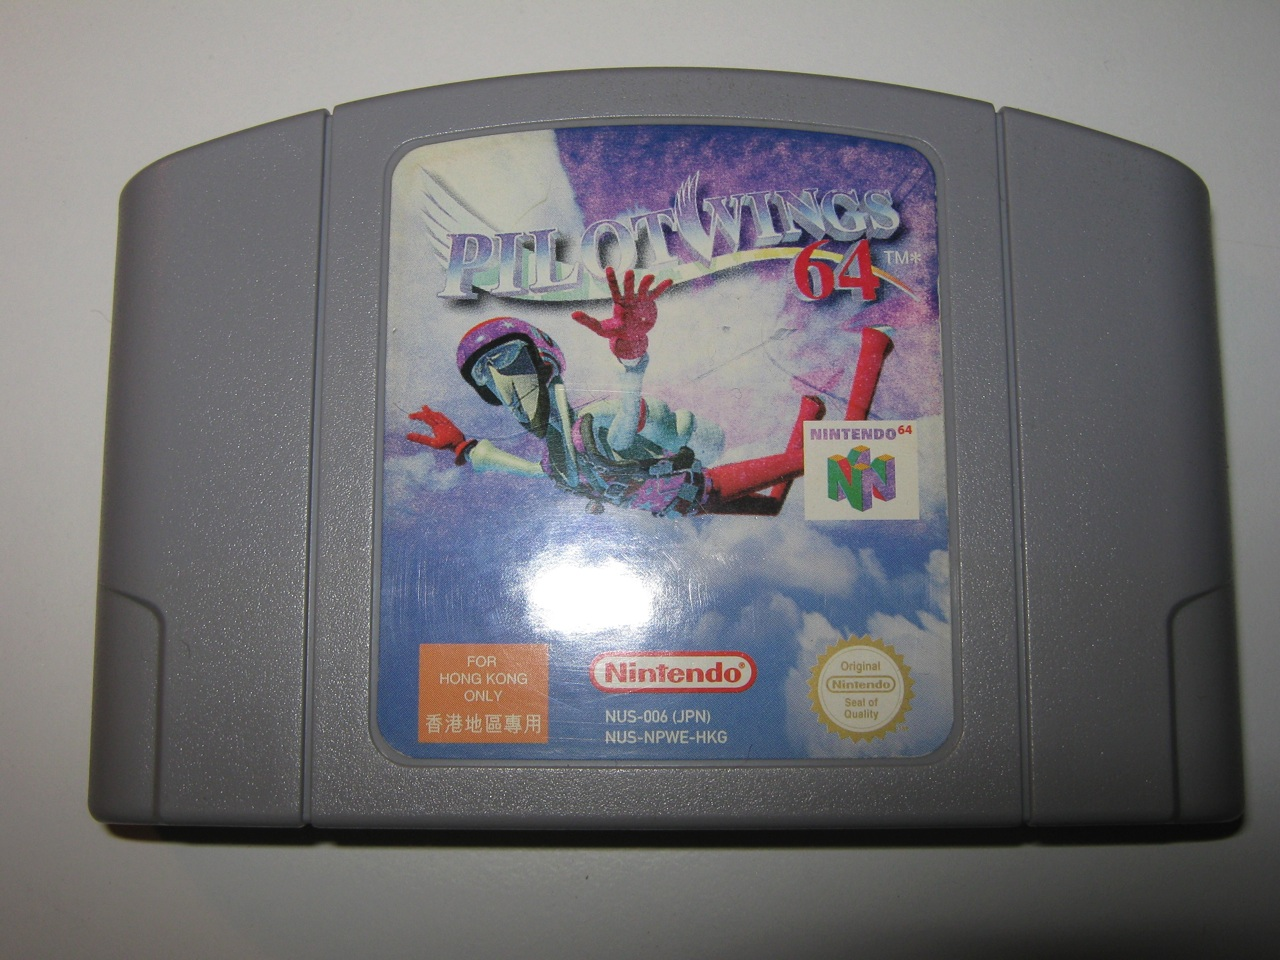 Nintendo 64 Hack Cartridge